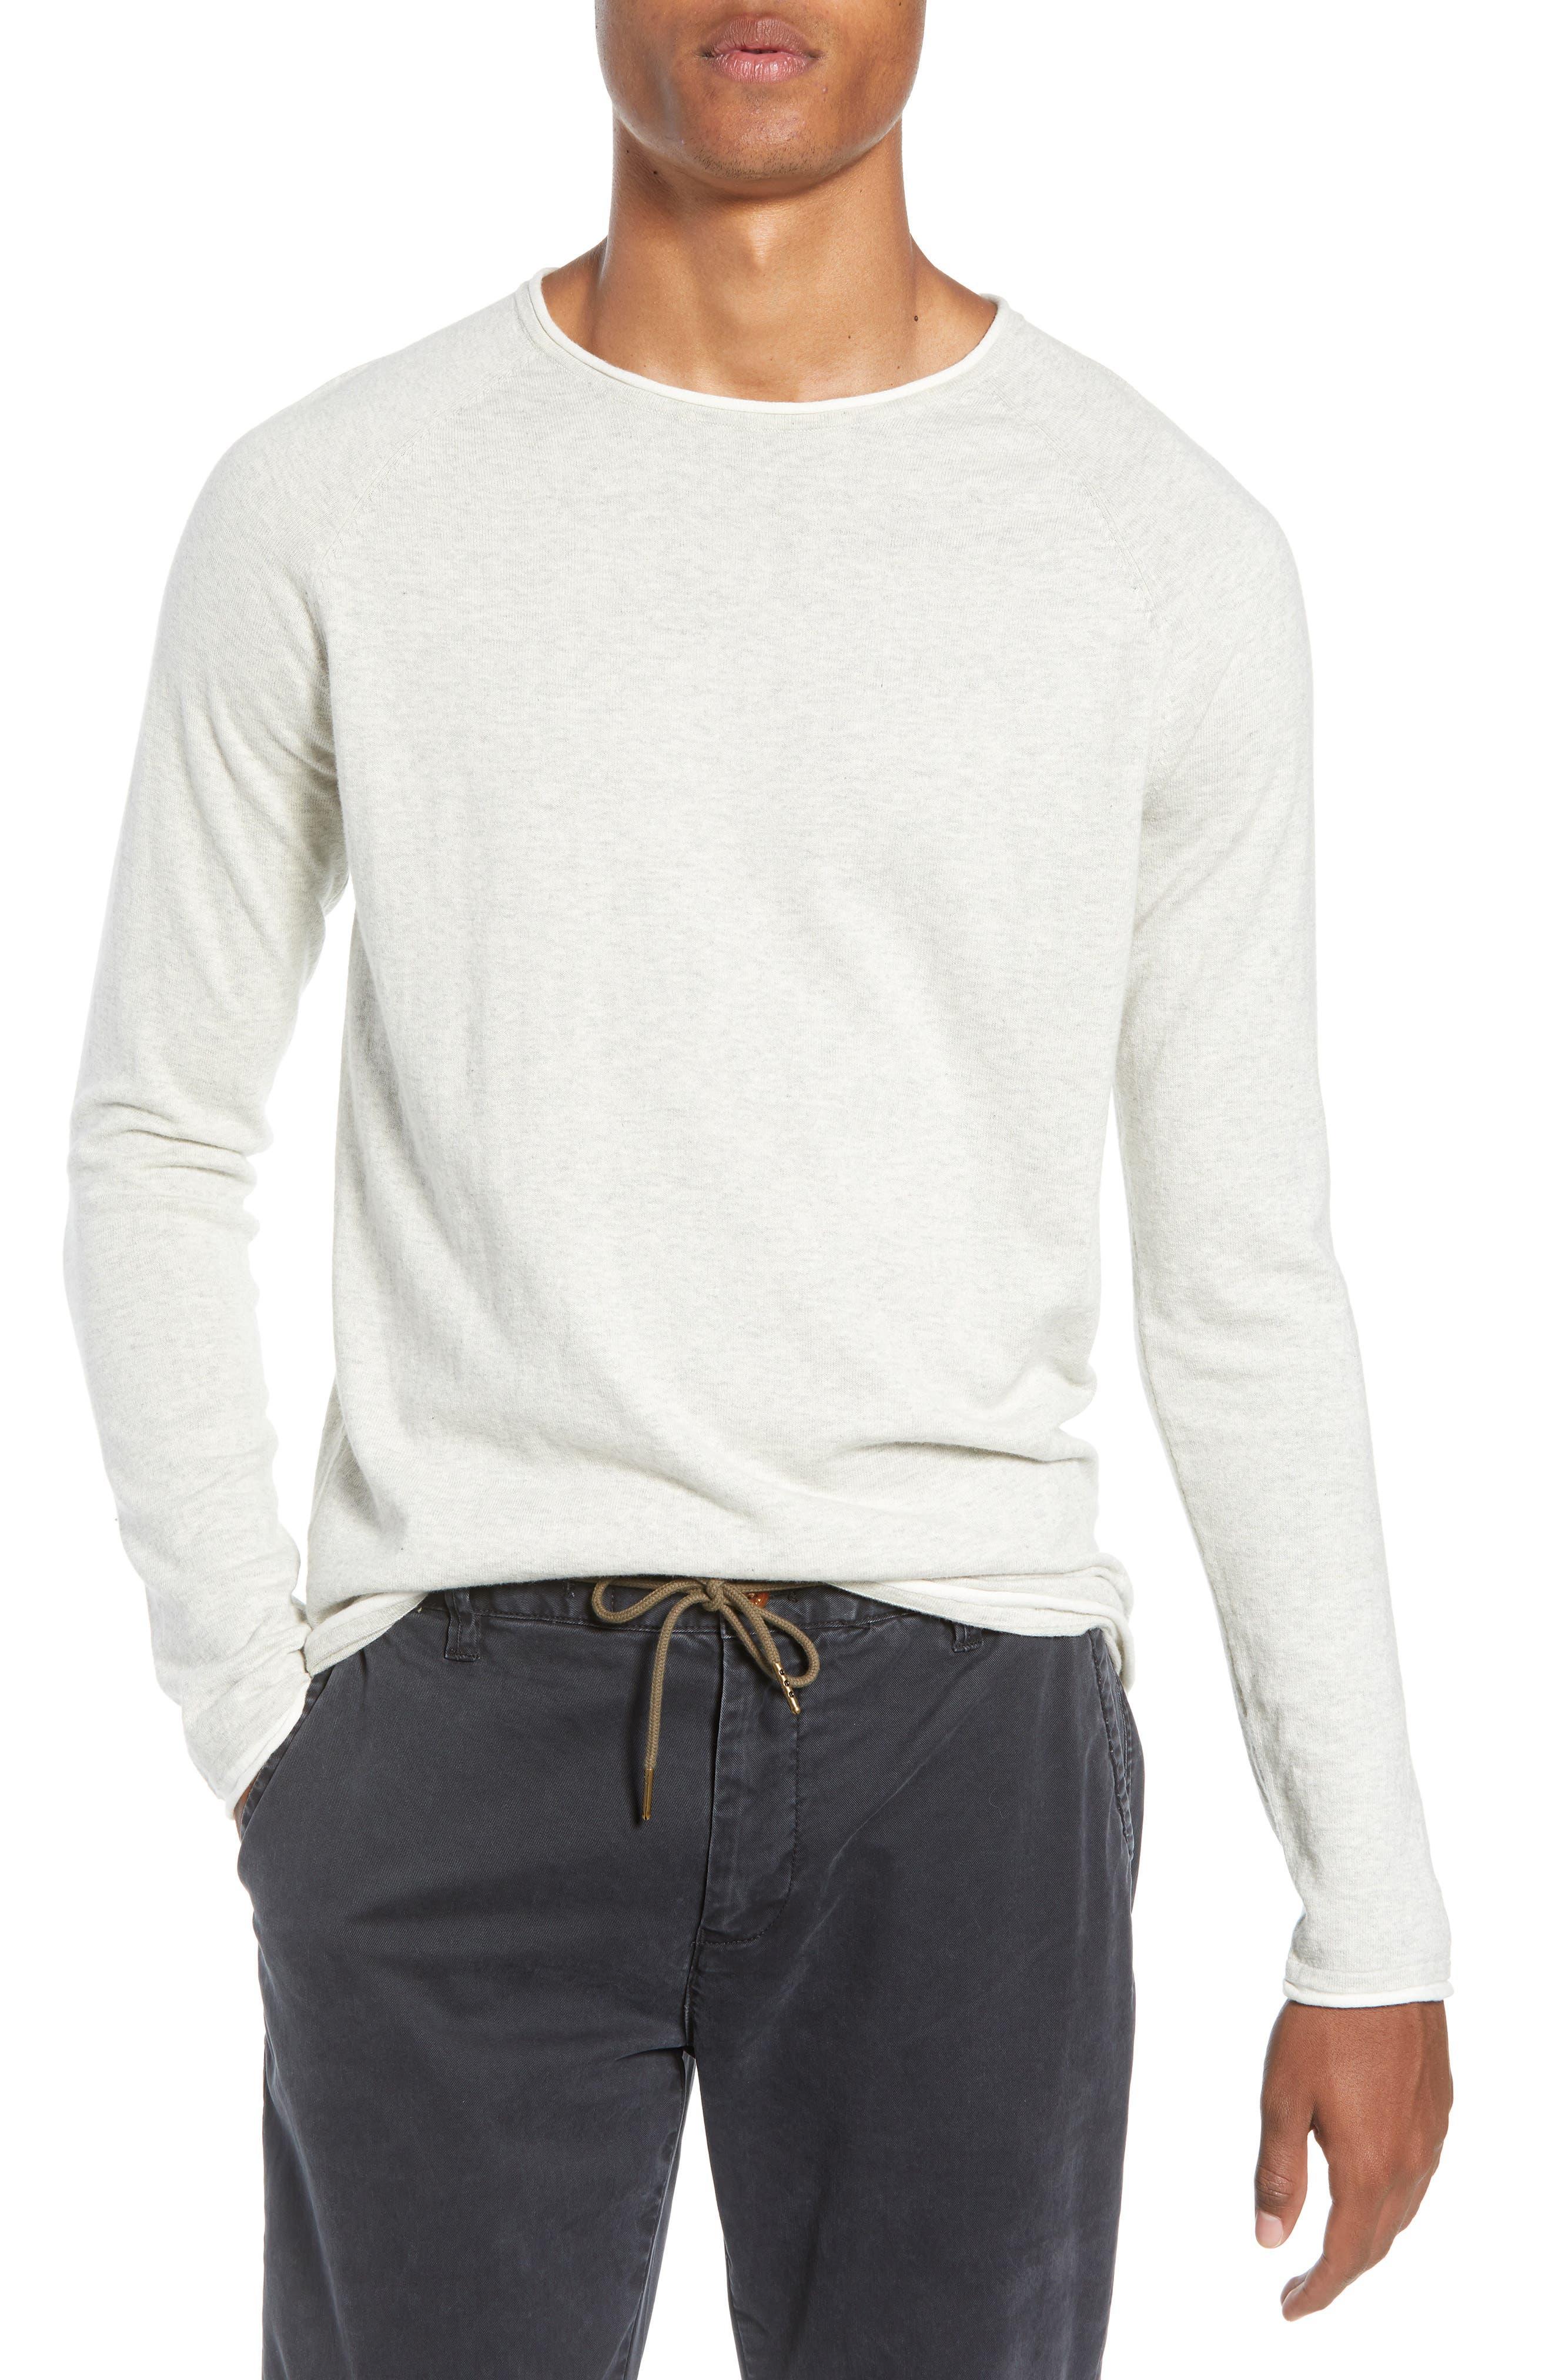 Crewneck Sweatshirt,                             Main thumbnail 1, color,                             BONE WHITE MELANGE